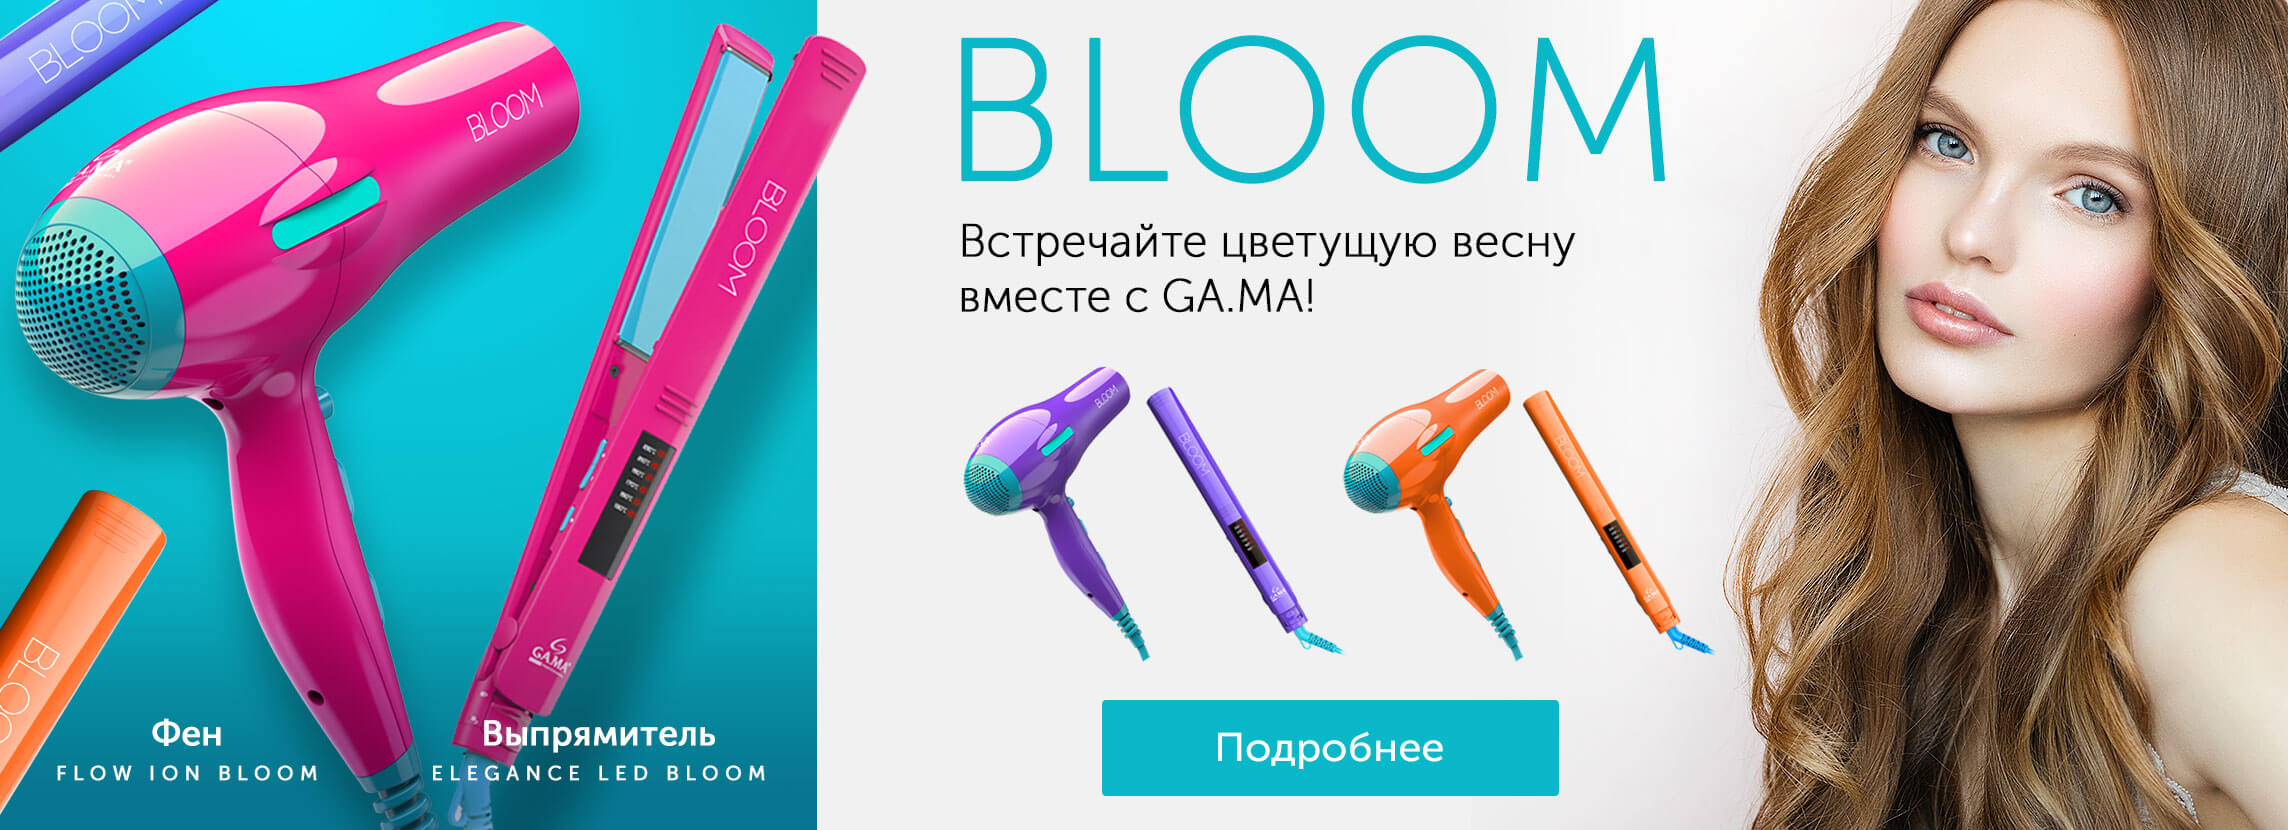 1519814654_0_bloom_2288x830_fin.jpg